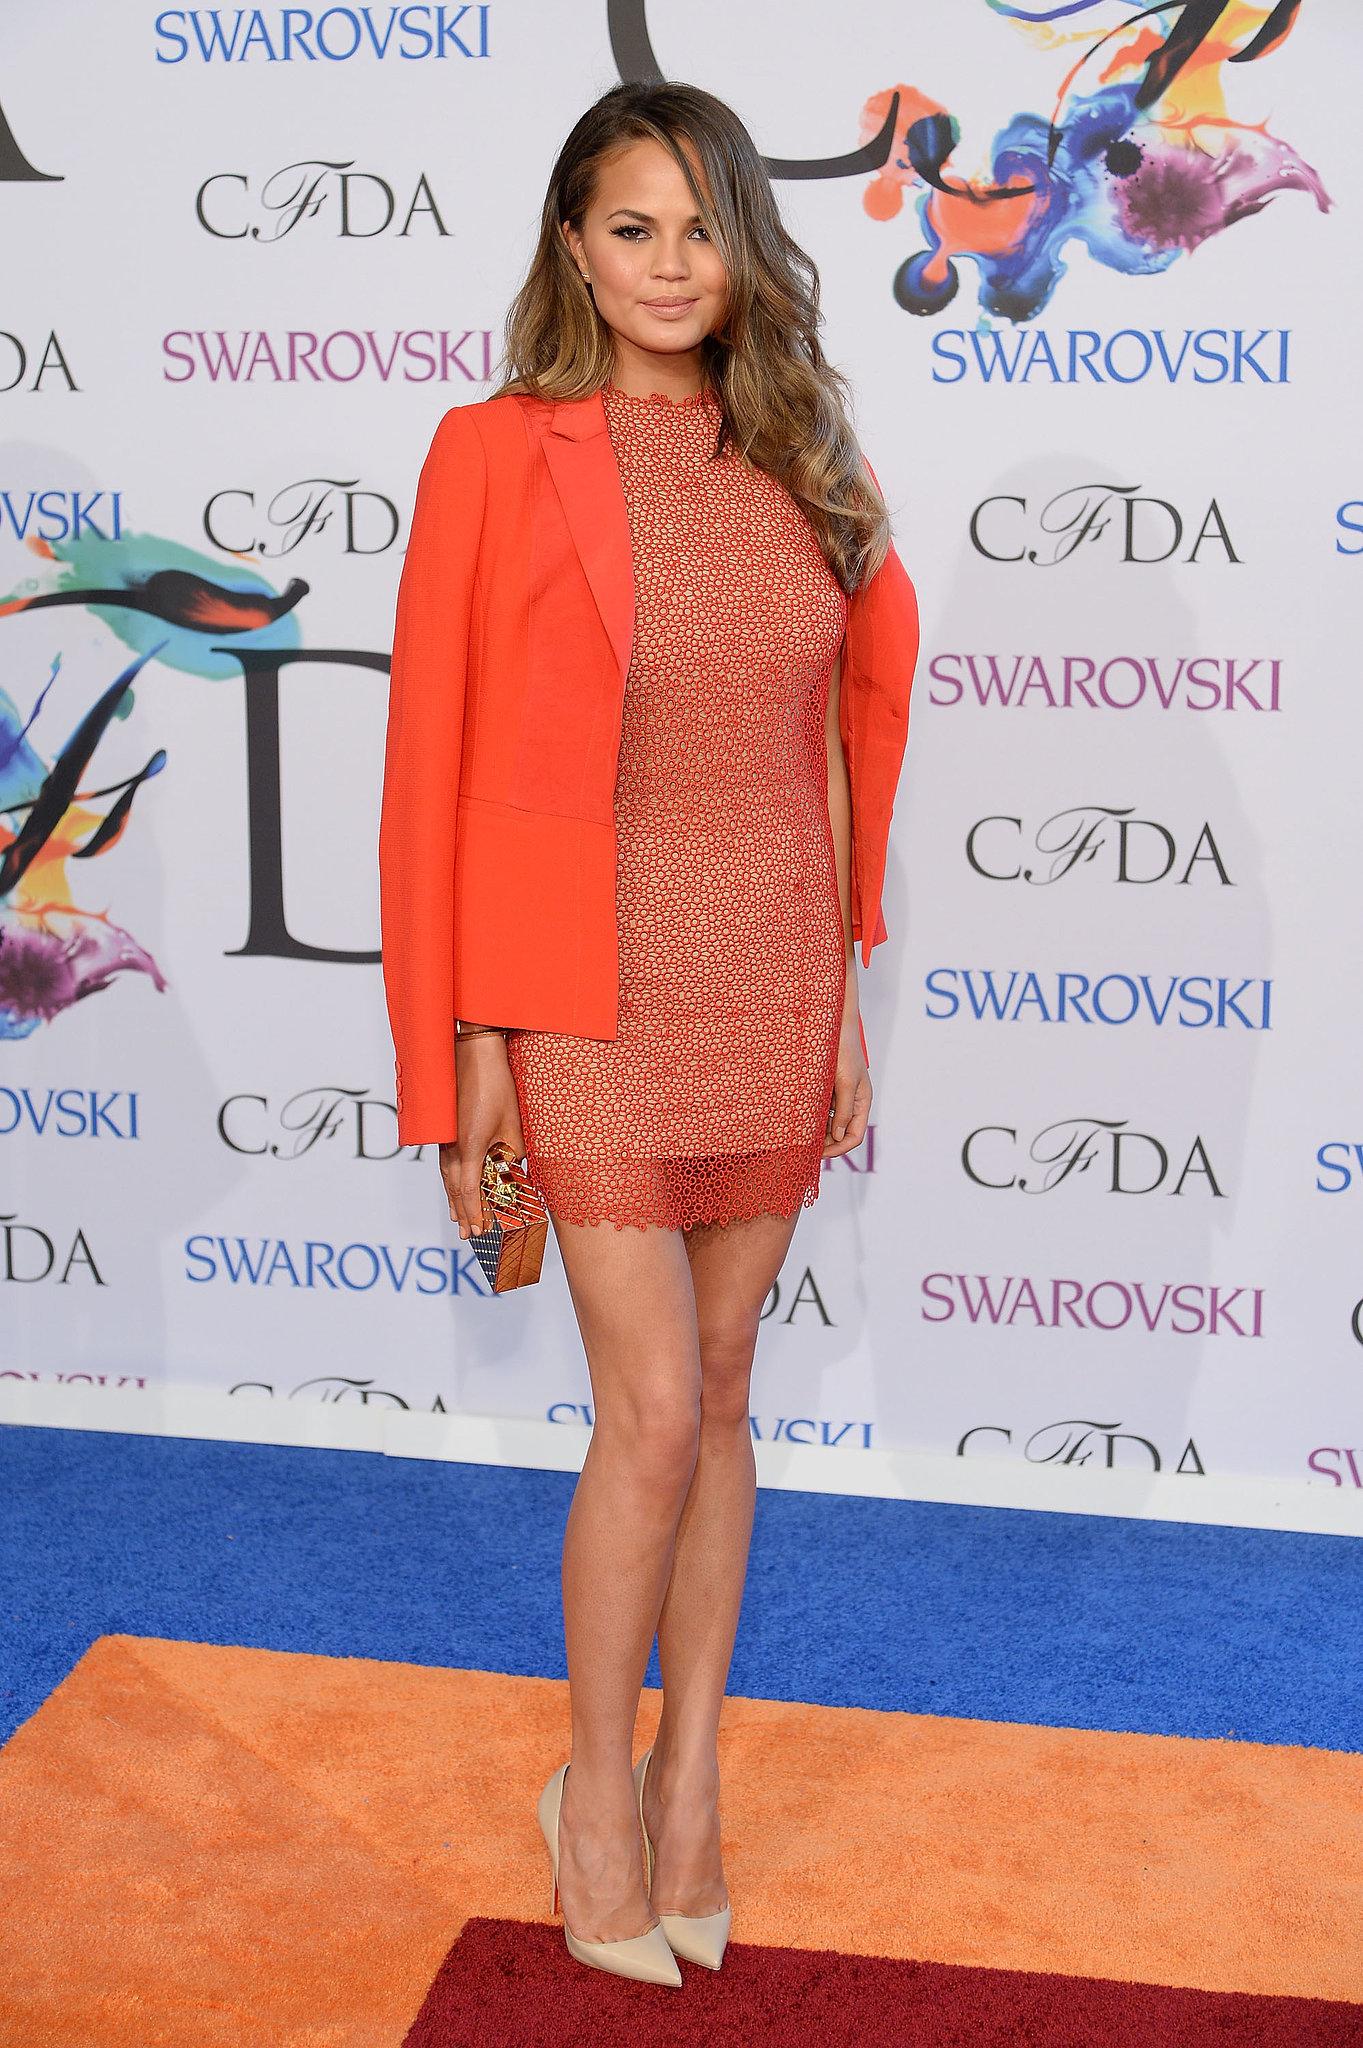 Chrissy Teigen wore an orange Rachel Roy ensemble.